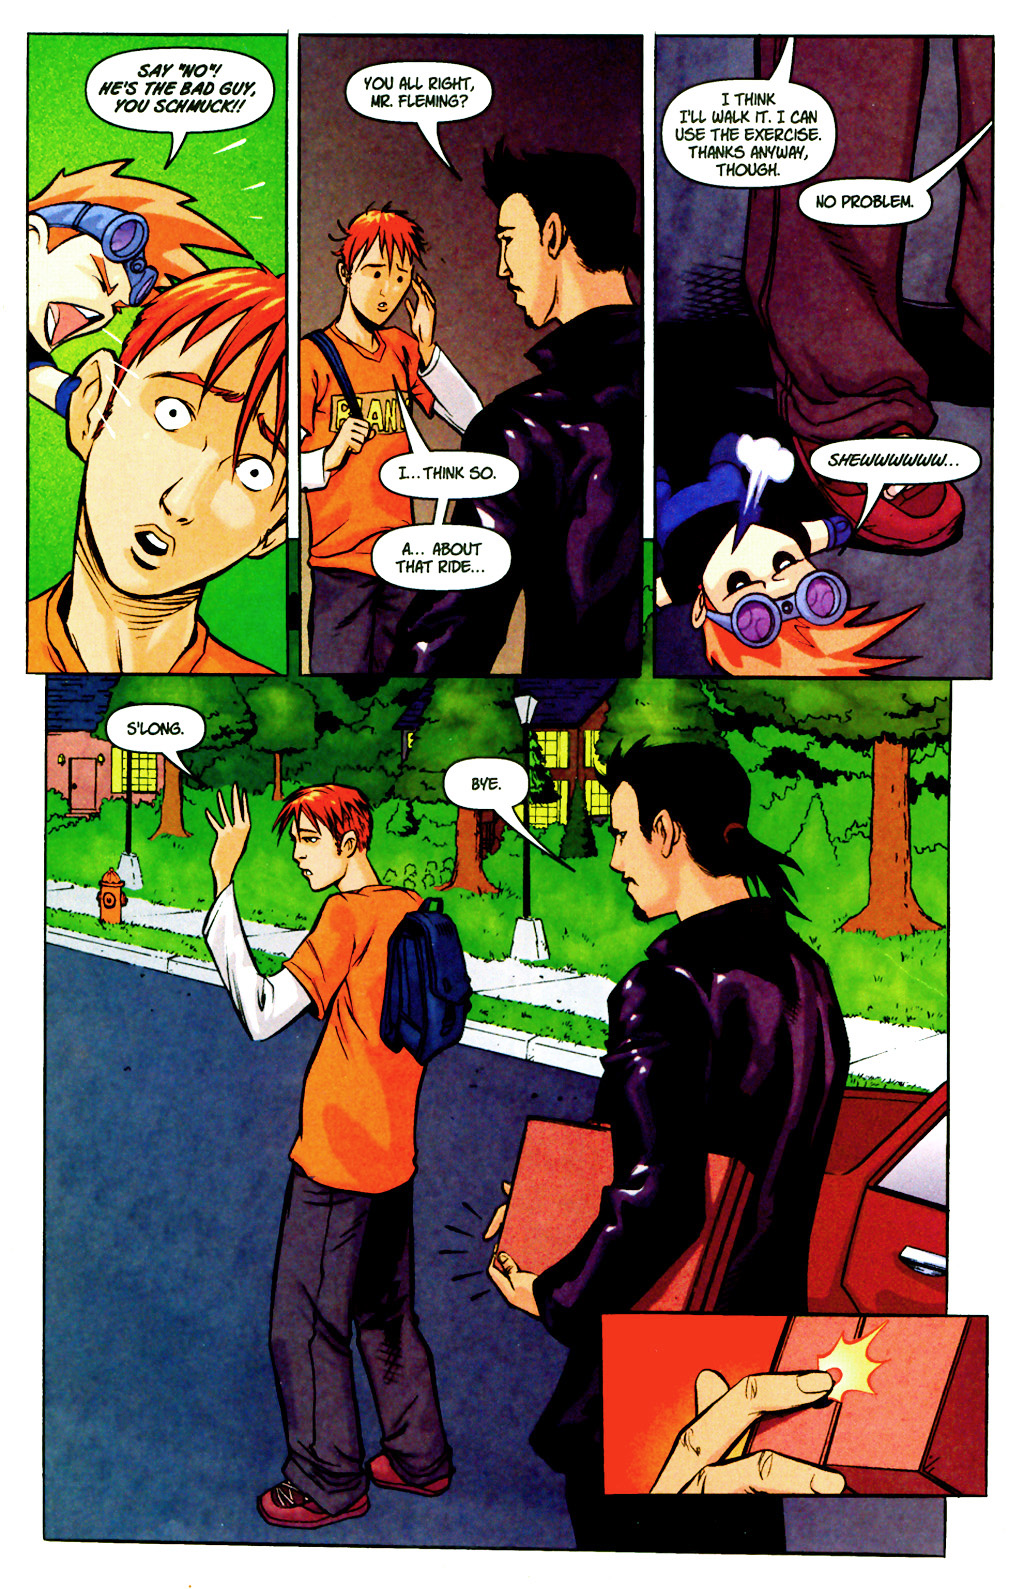 Read online SpyBoy: Final Exam comic -  Issue #2 - 8